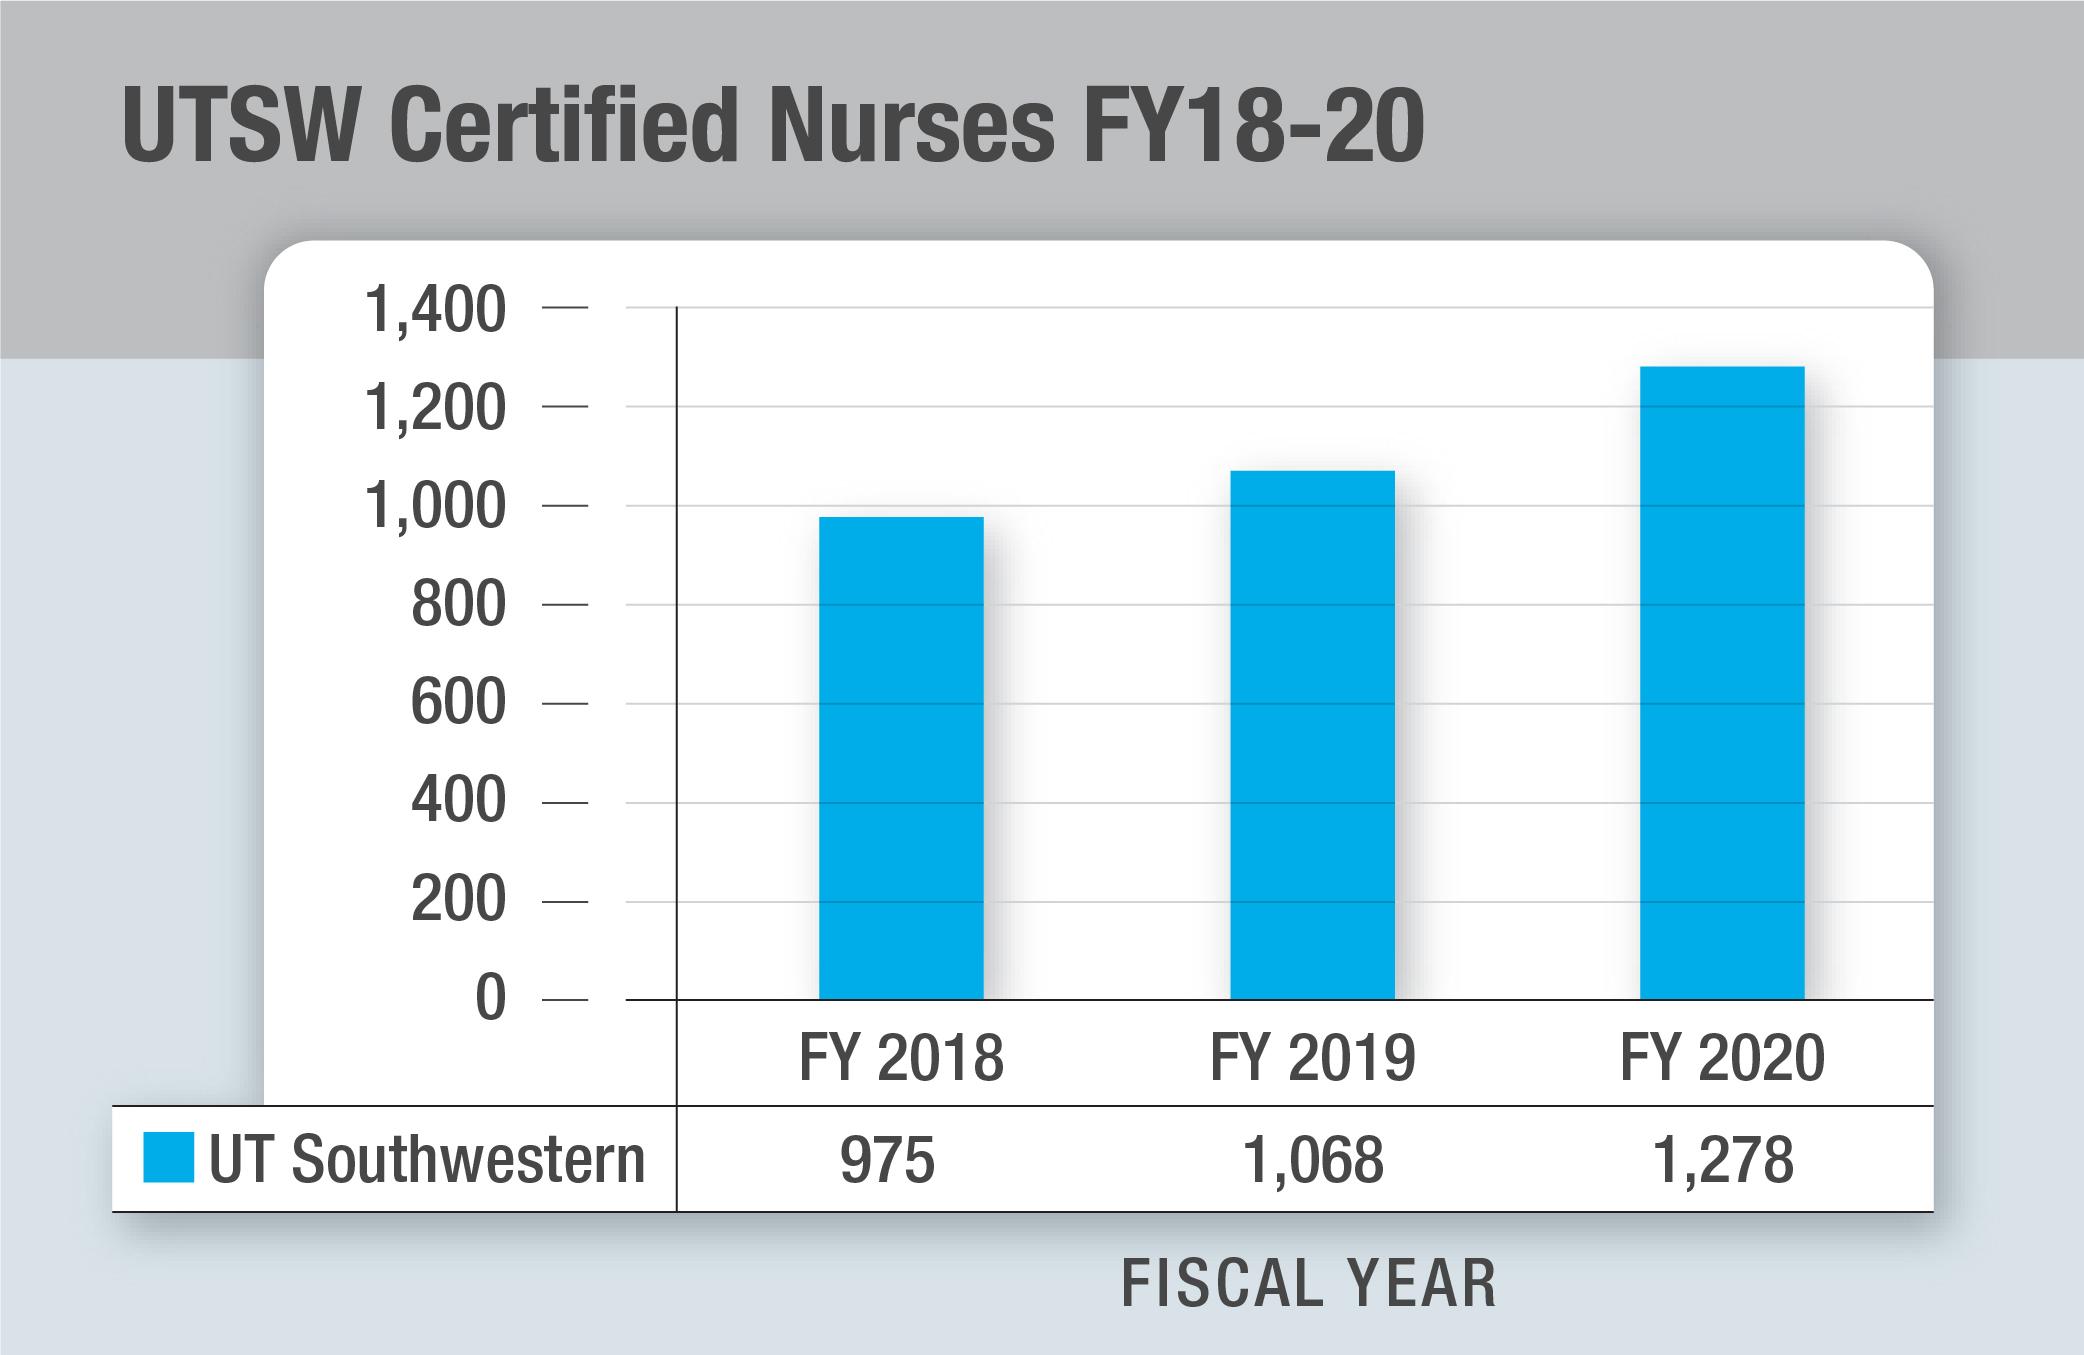 UTSW Certified Nurses Graphic